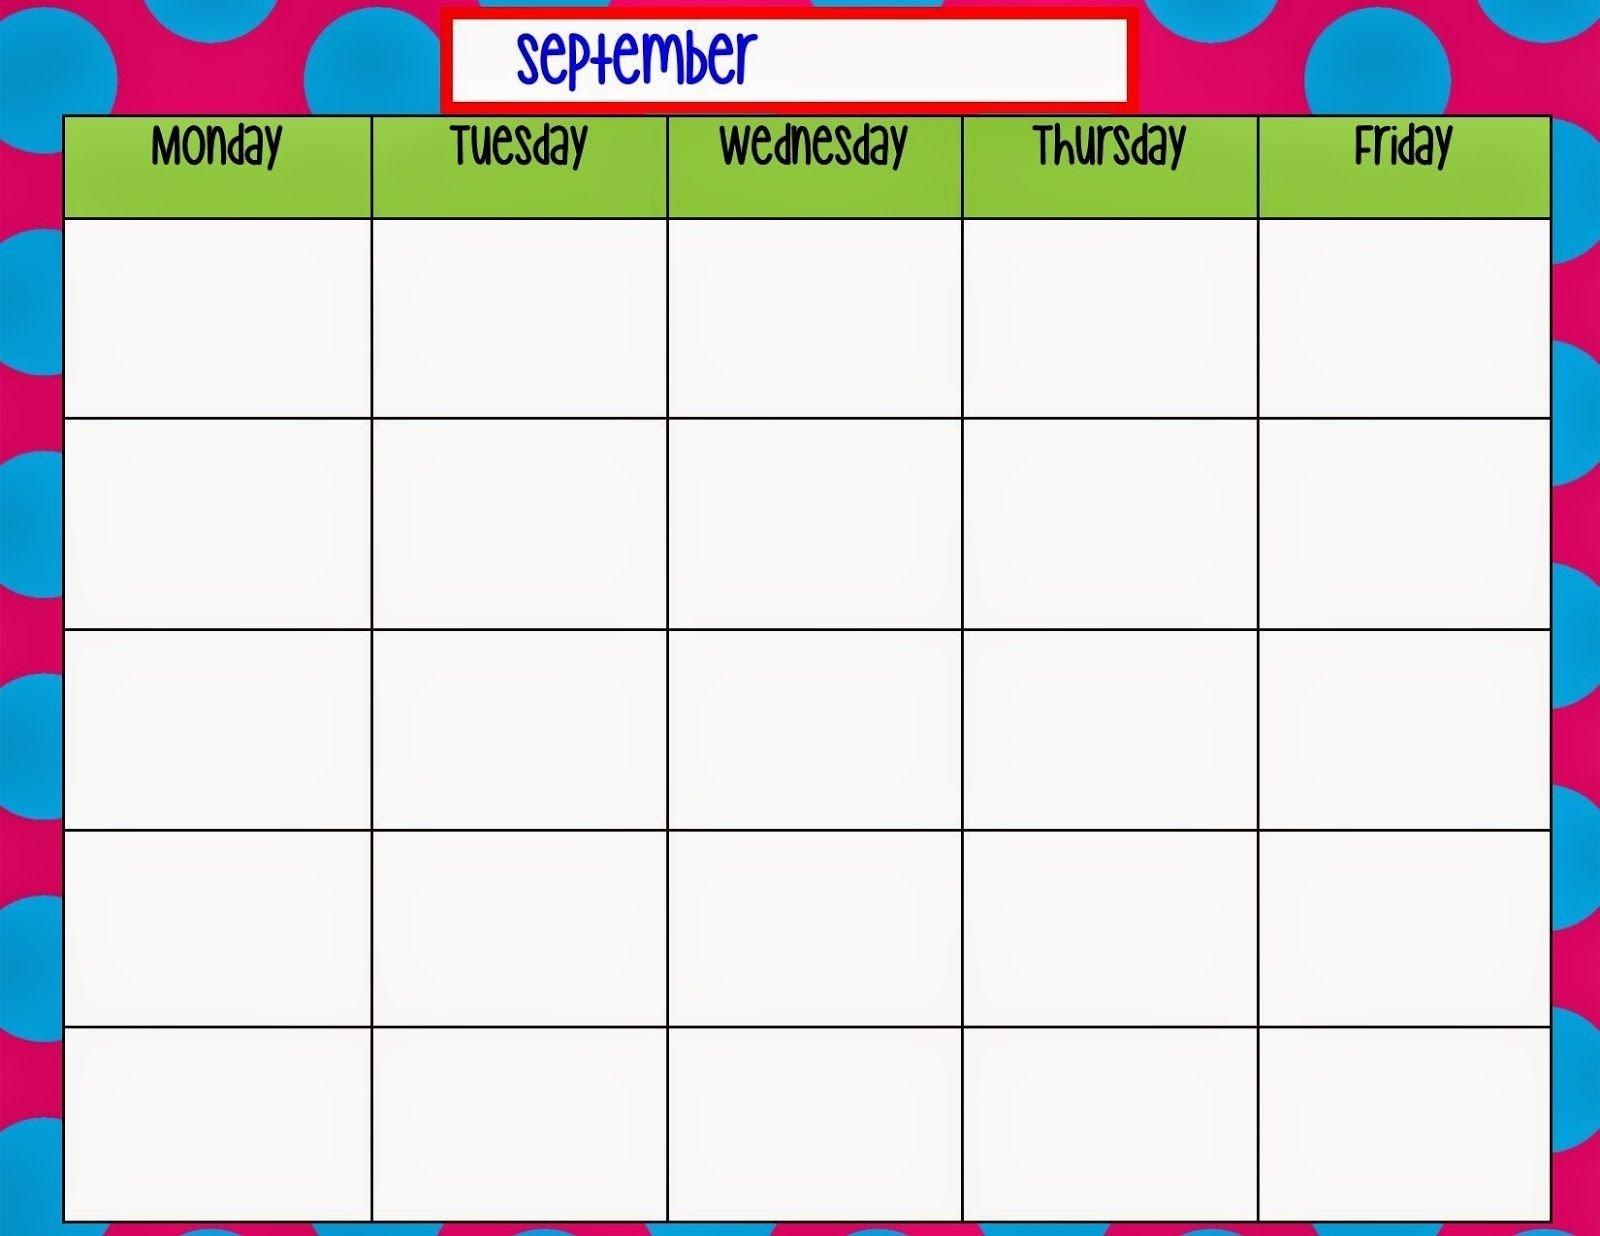 Monday To Friday Blank Calendar Printable | Calendar Free Printable Blank Calendar Monday Friday